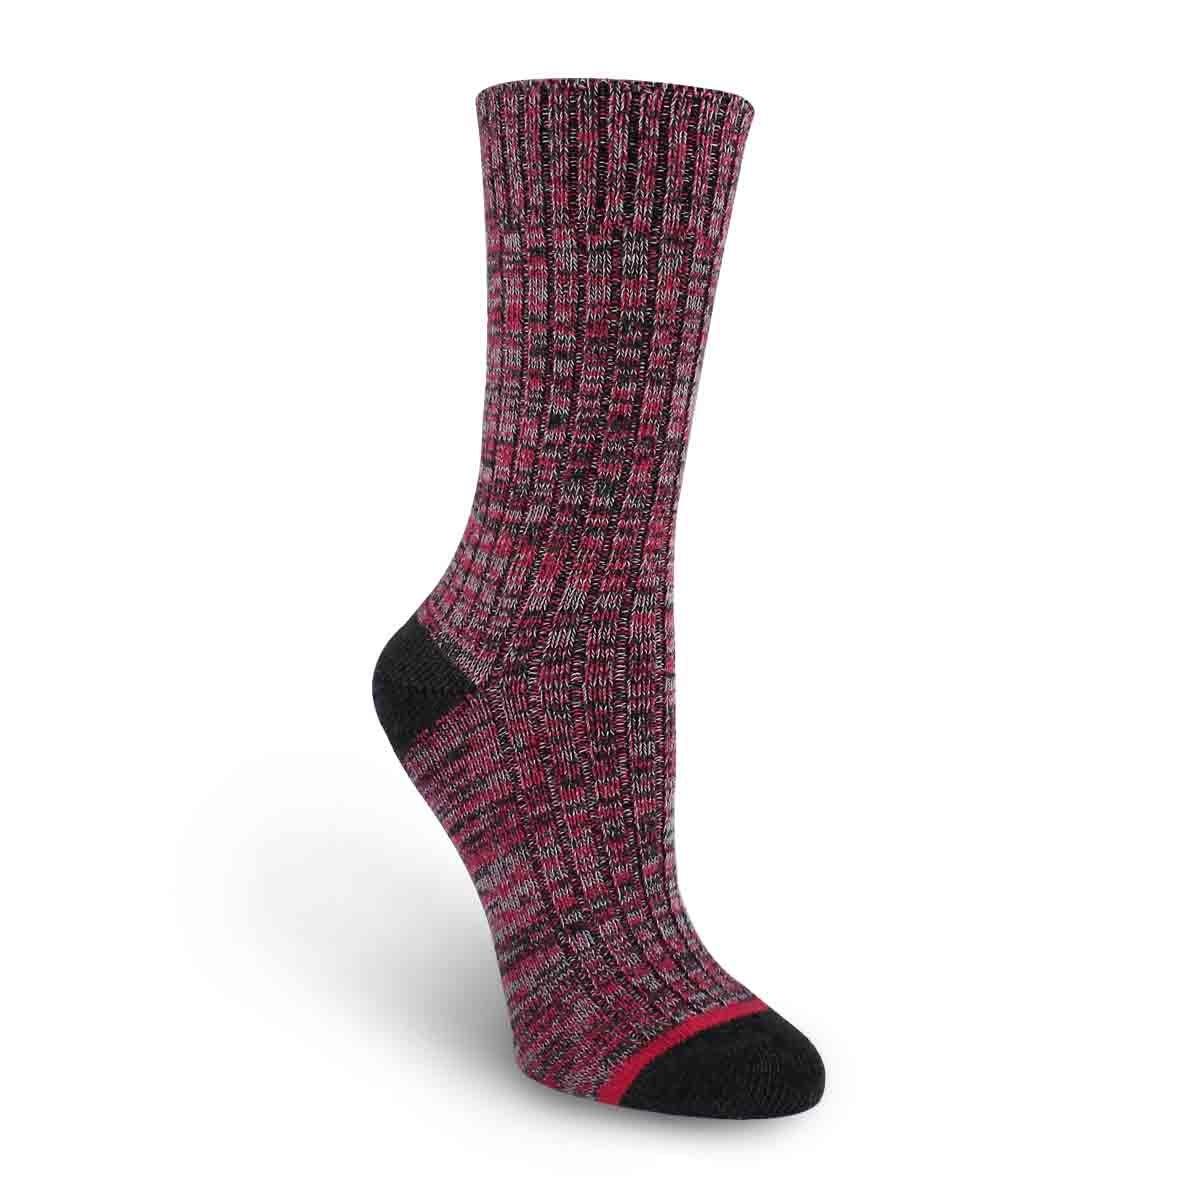 Lds Spacedye char/rose tall sock